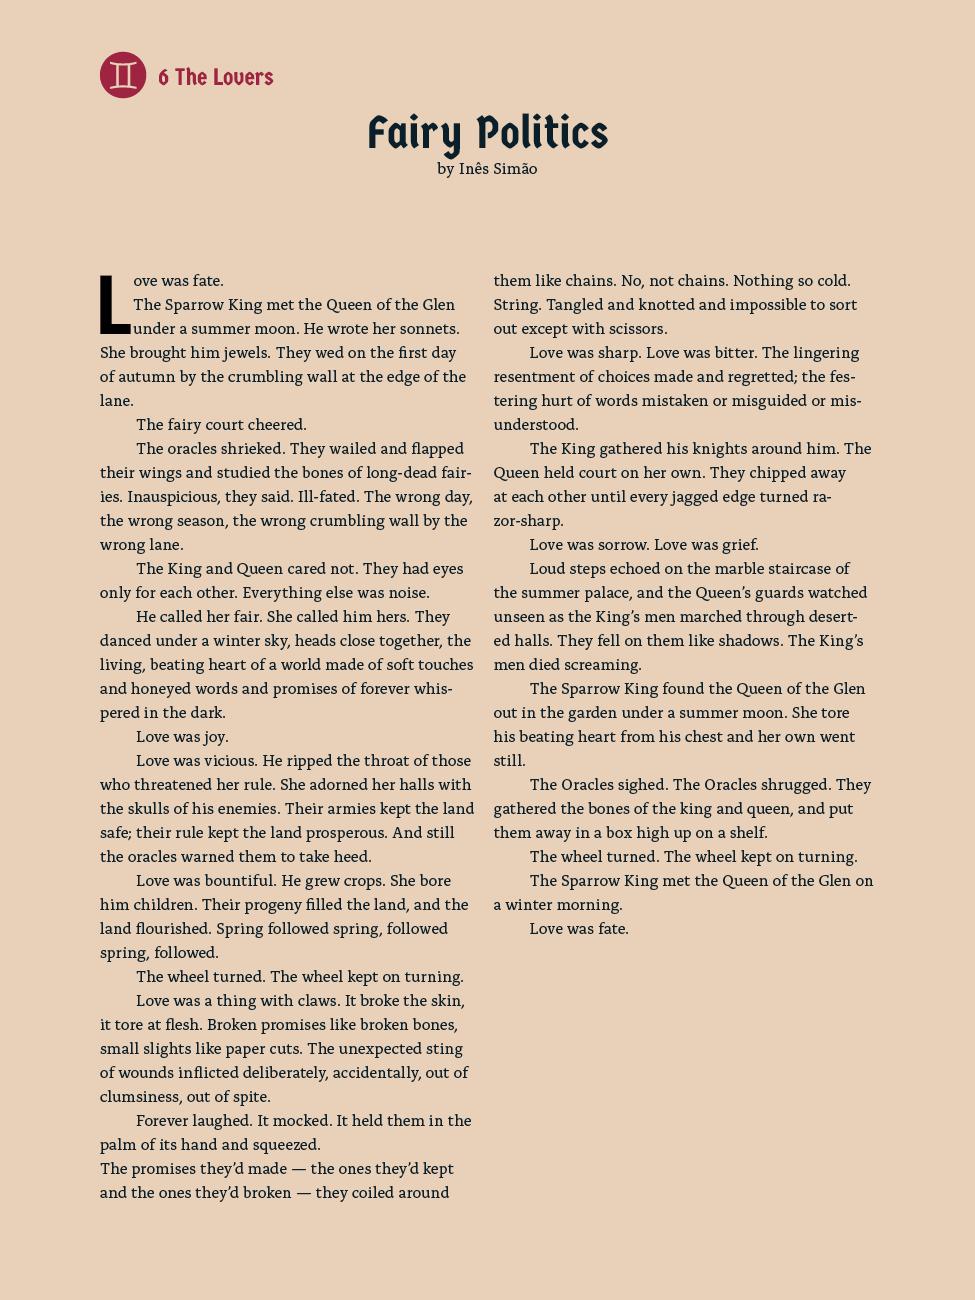 6 The Lovers - Fairy Politics - Inês Simão